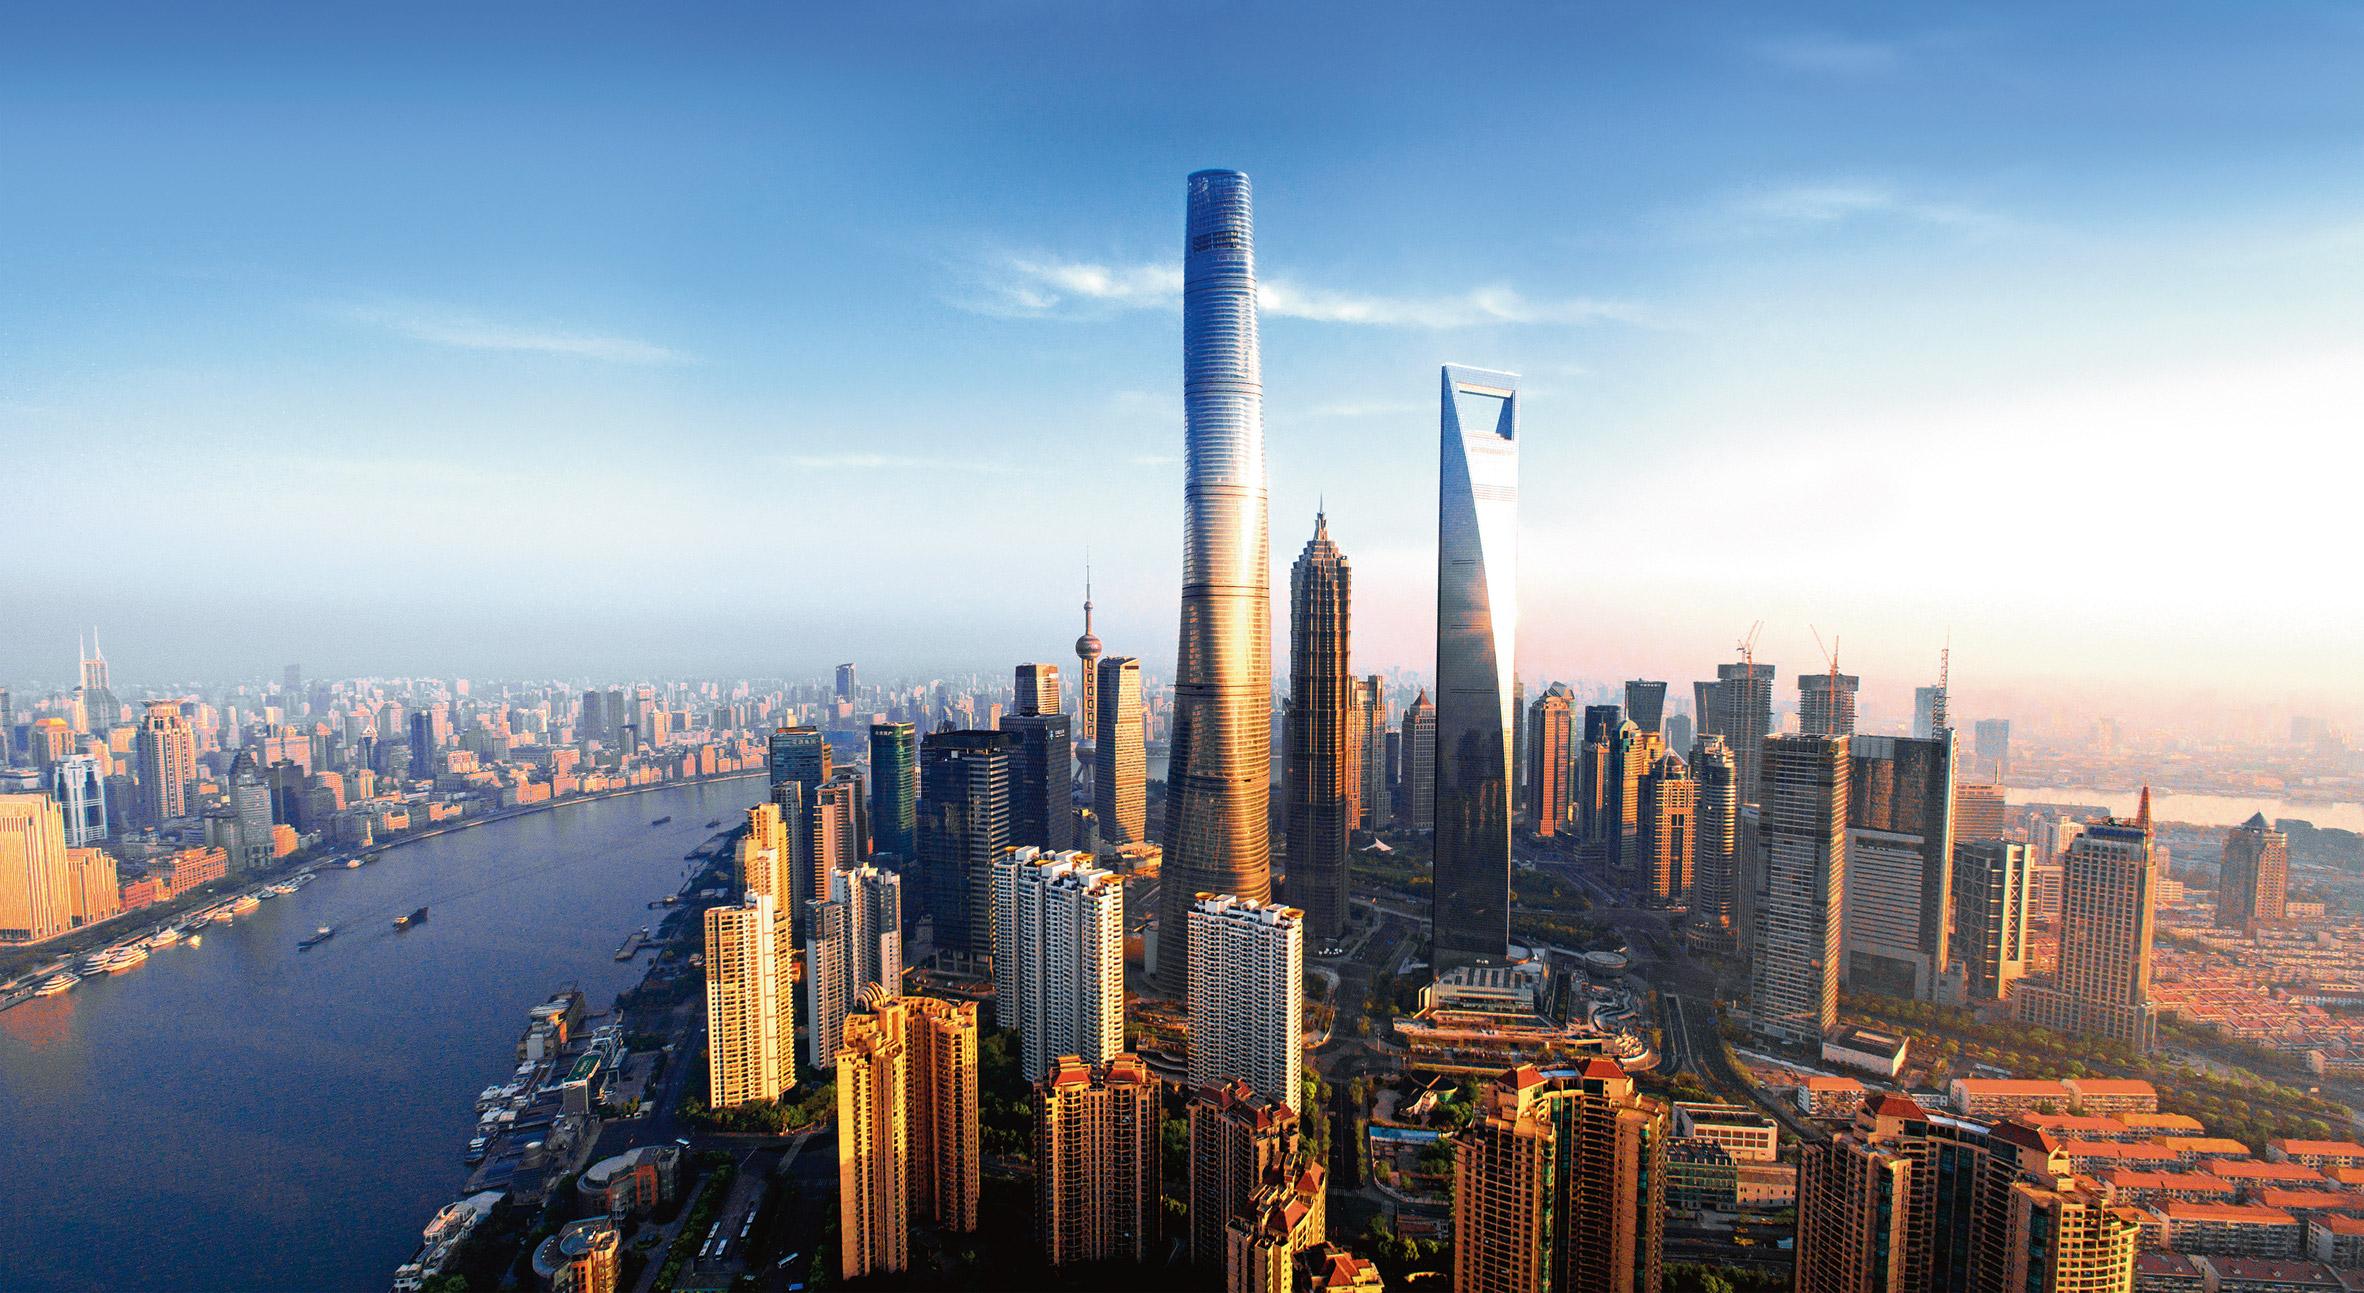 Shanghai Tower by Gensler